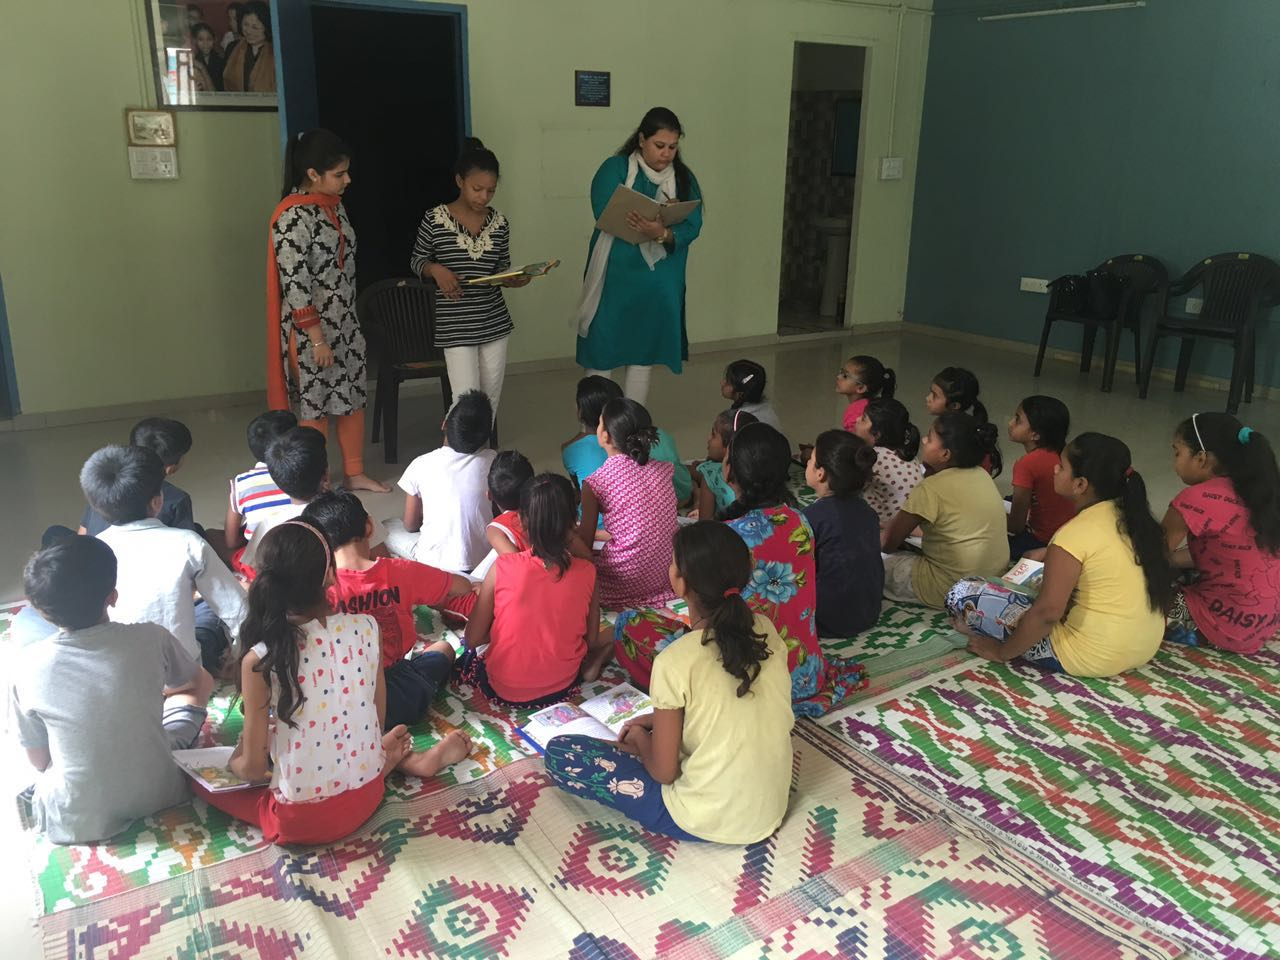 Interns teaching the students at Peeragarhi slum colony.